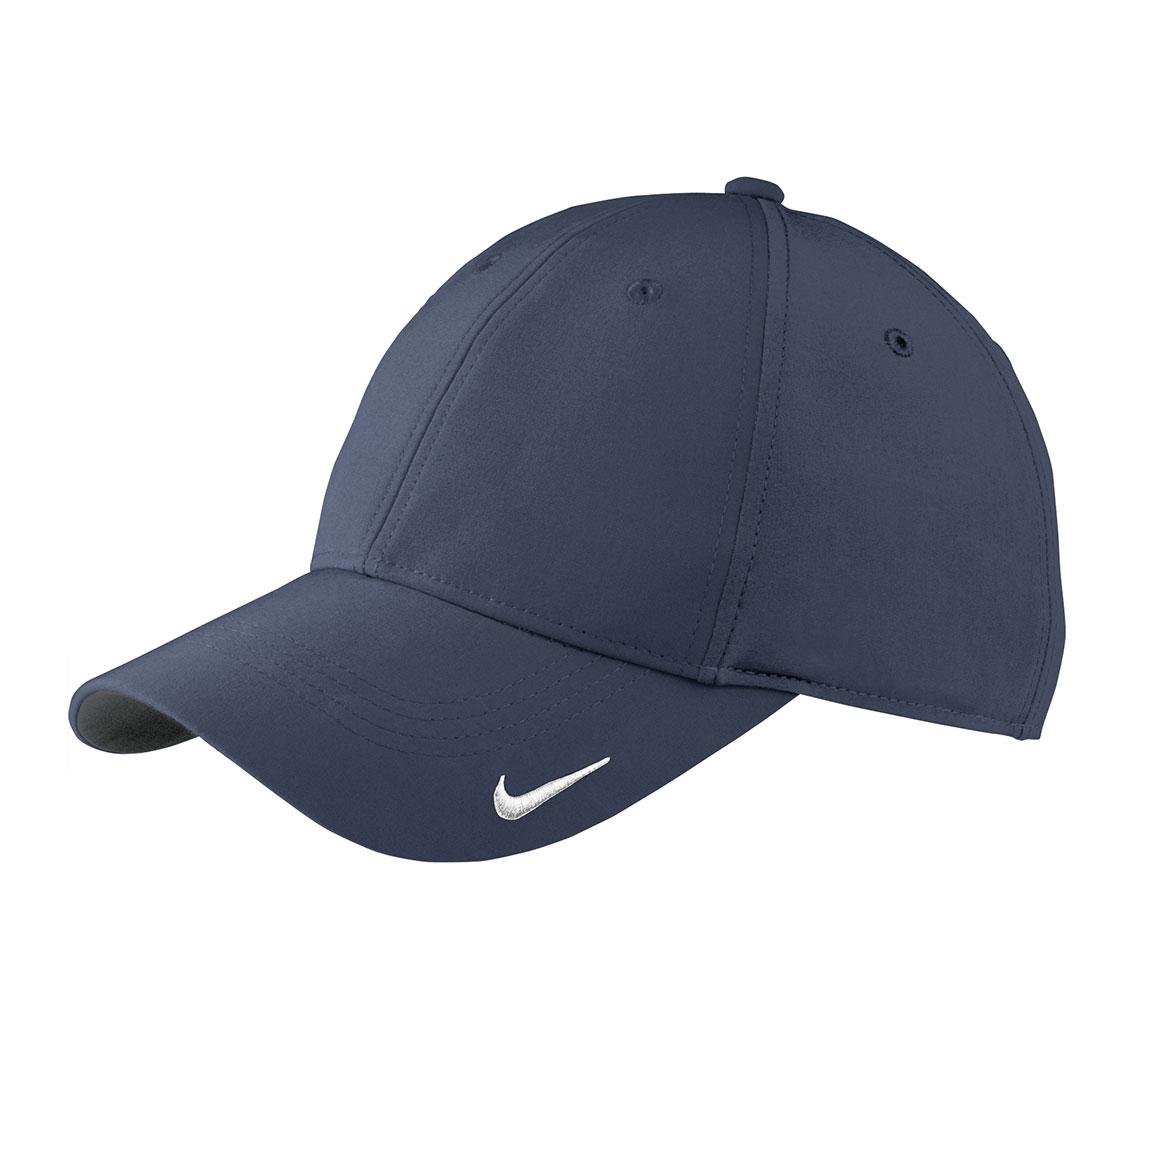 inspire golf hat